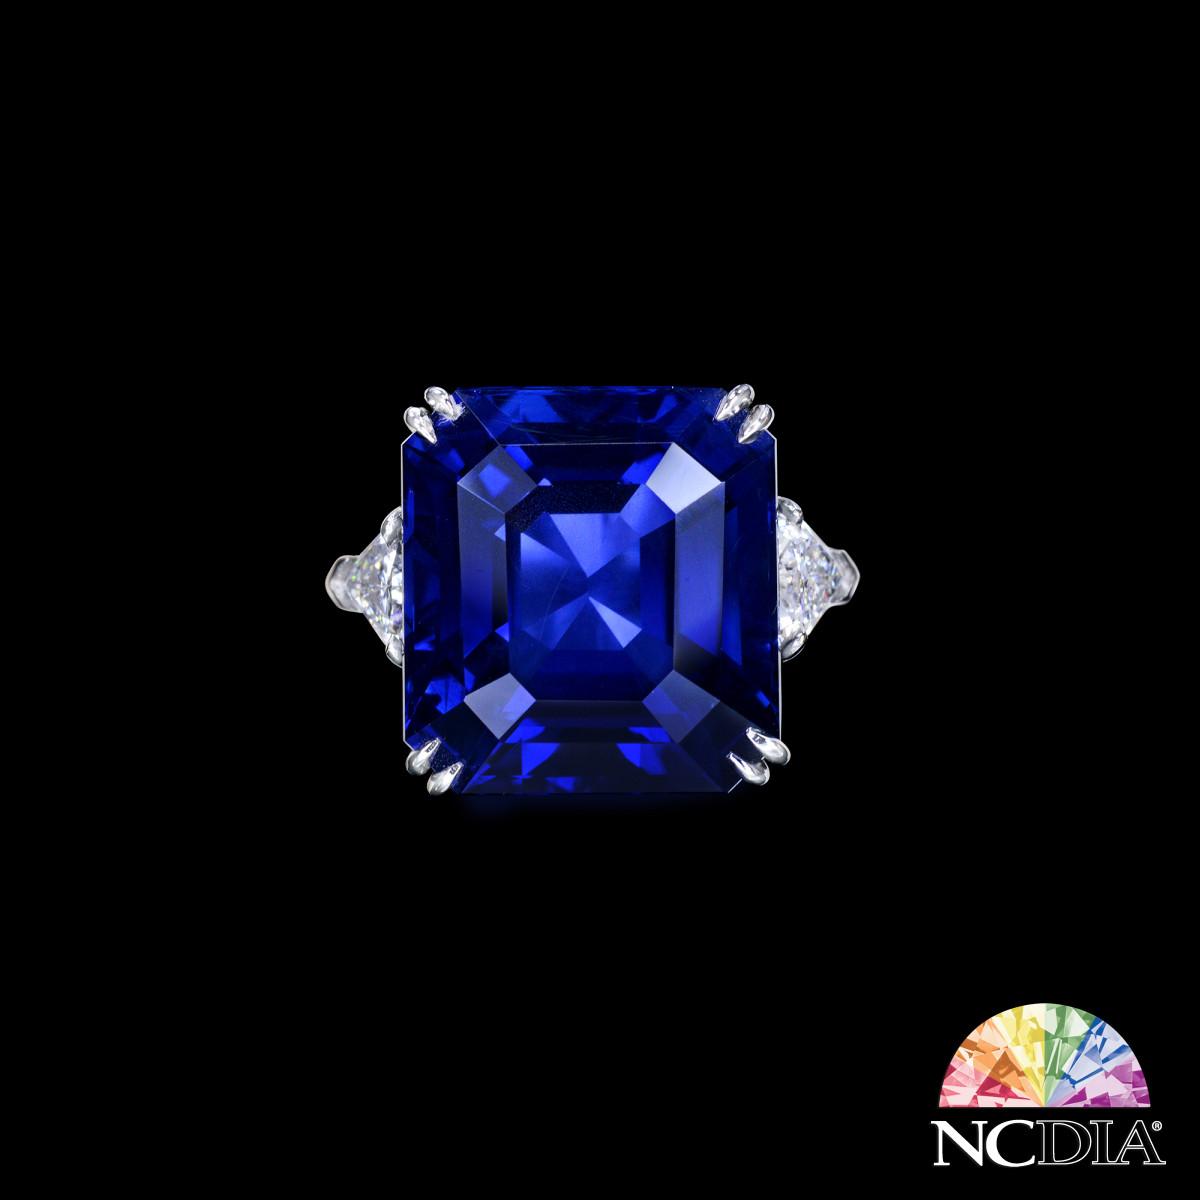 Over 27ct Unheated Emerald Cut Royal Blue Burmese Sapphire Diamond Ring, GUB/SSEF cert ava.